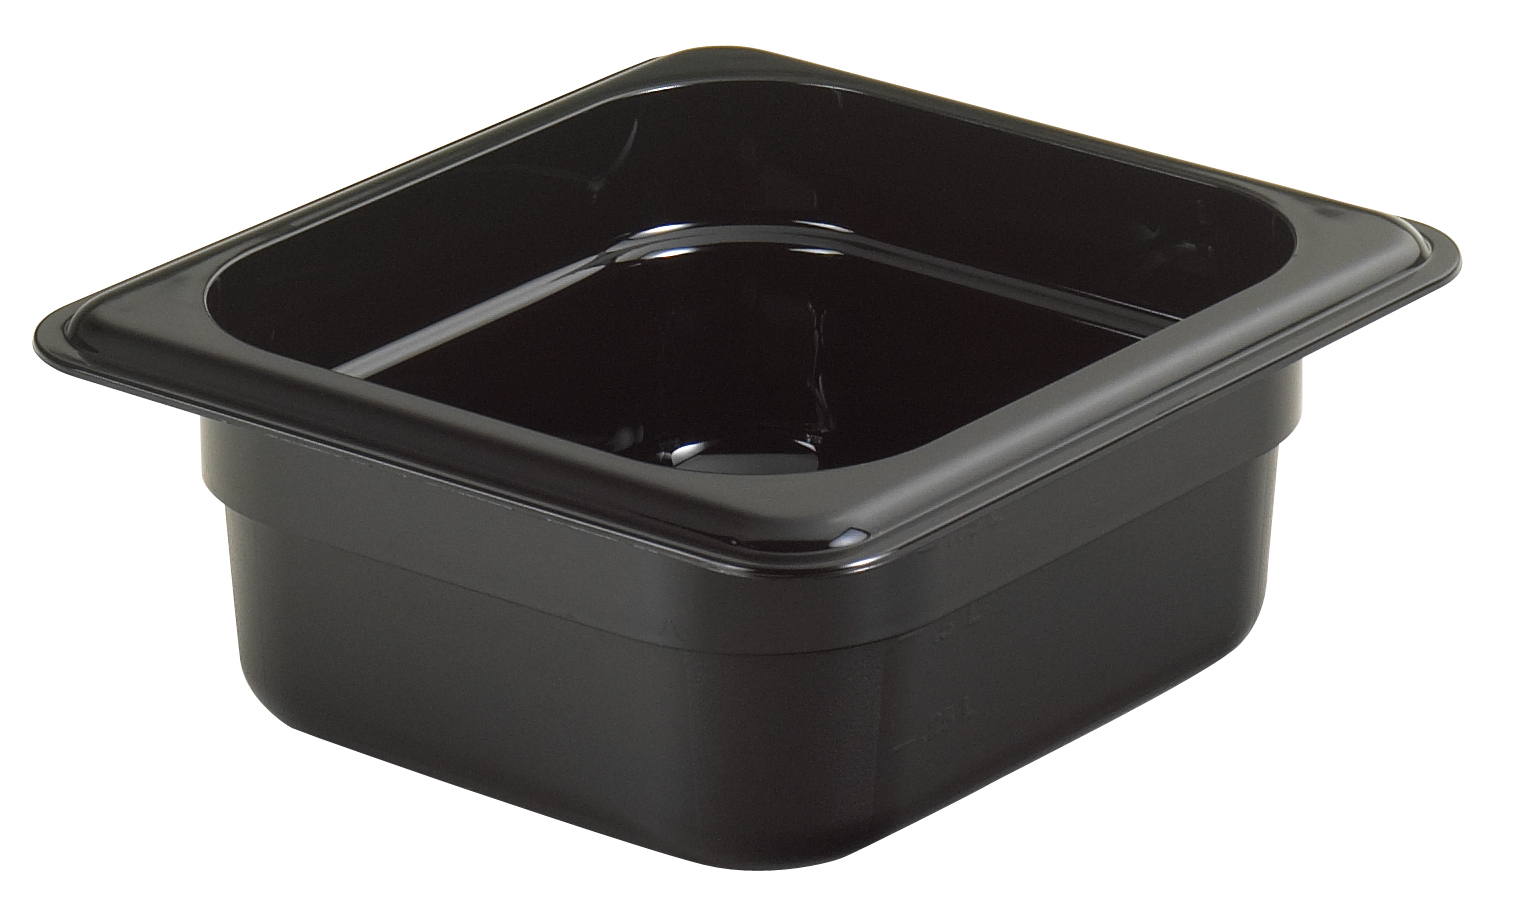 Cambro 62HP110 food/beverage storage container